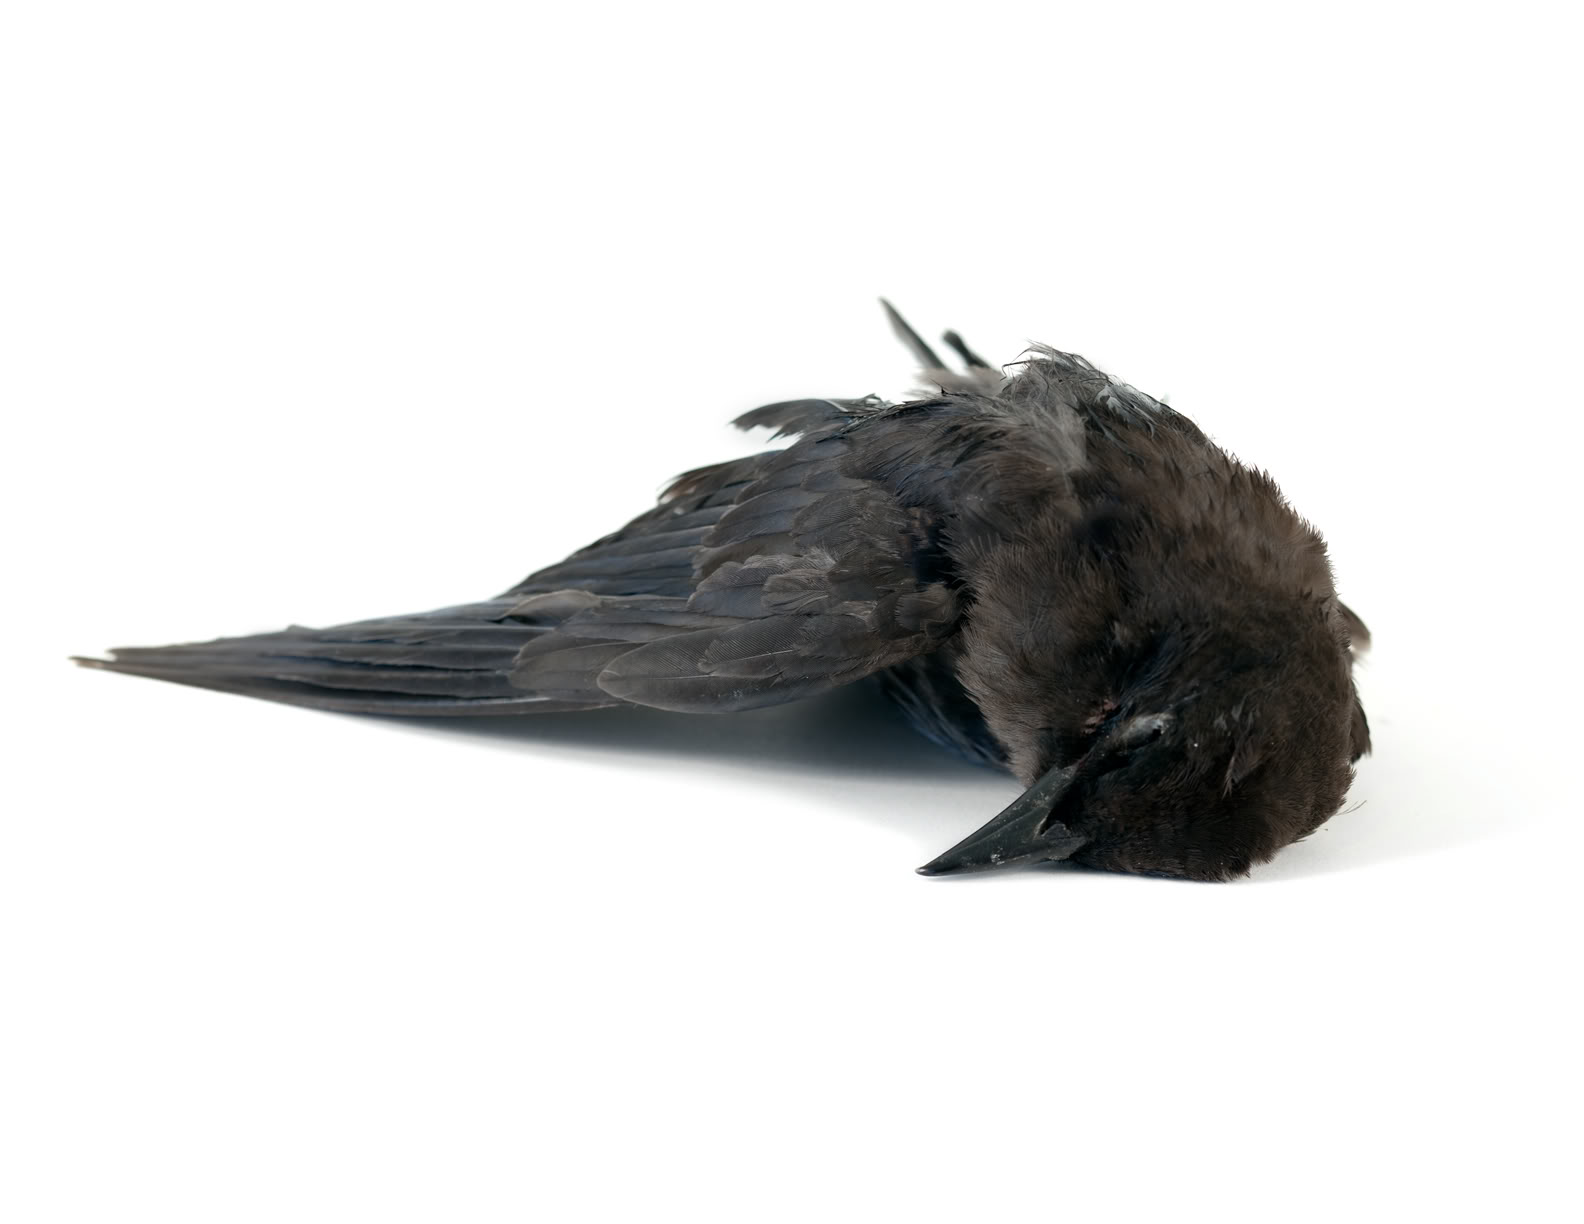 Dead blackbird photo